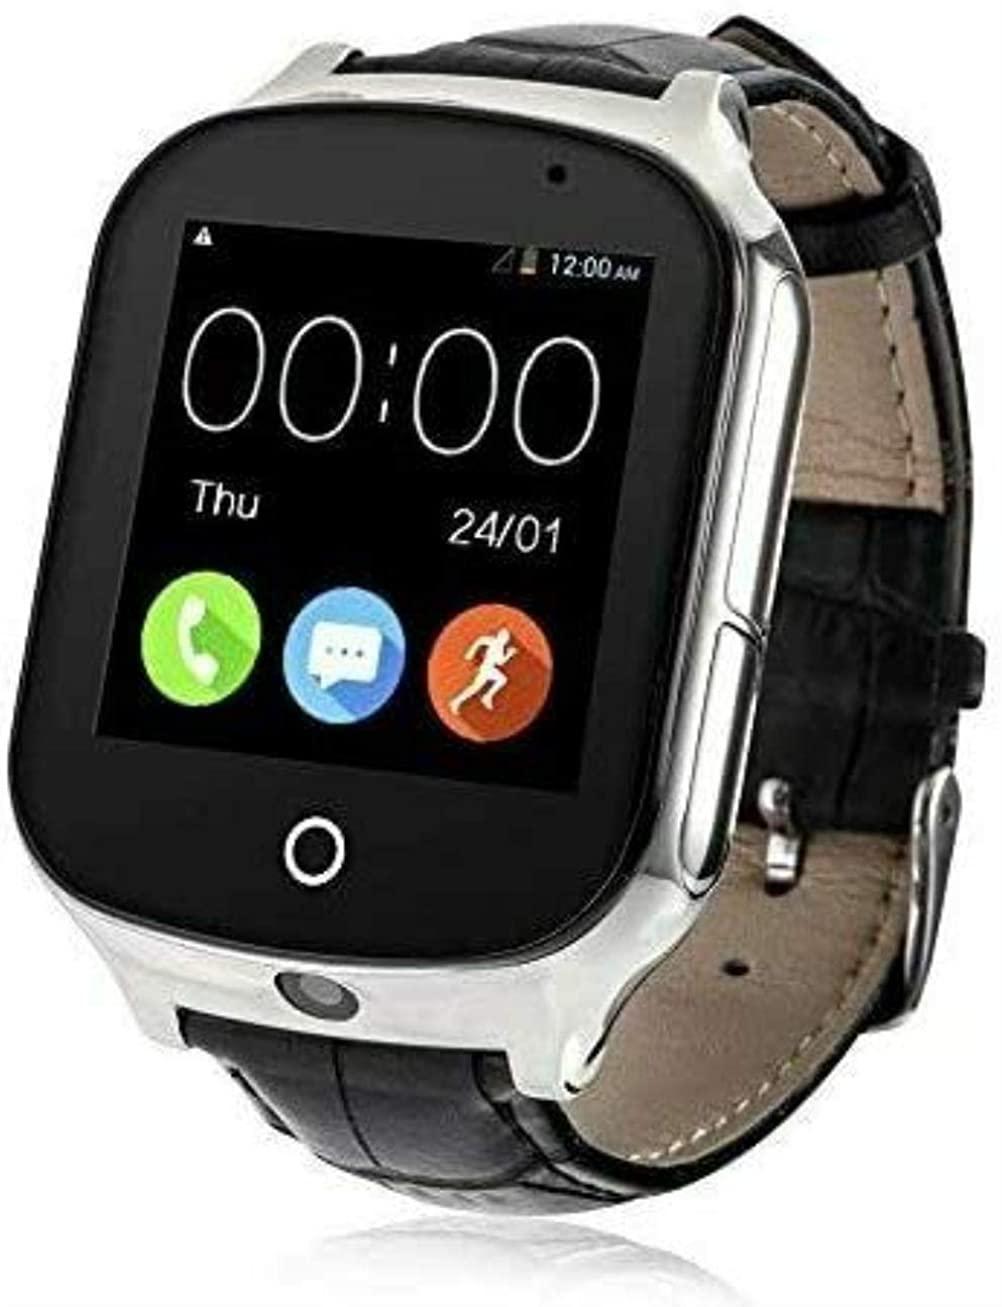 Drummond Smart Learning Watch, Kids Elderly GPS Smart Watch Phone Call Camera Pedometer Anti-Lost Tracker Watch